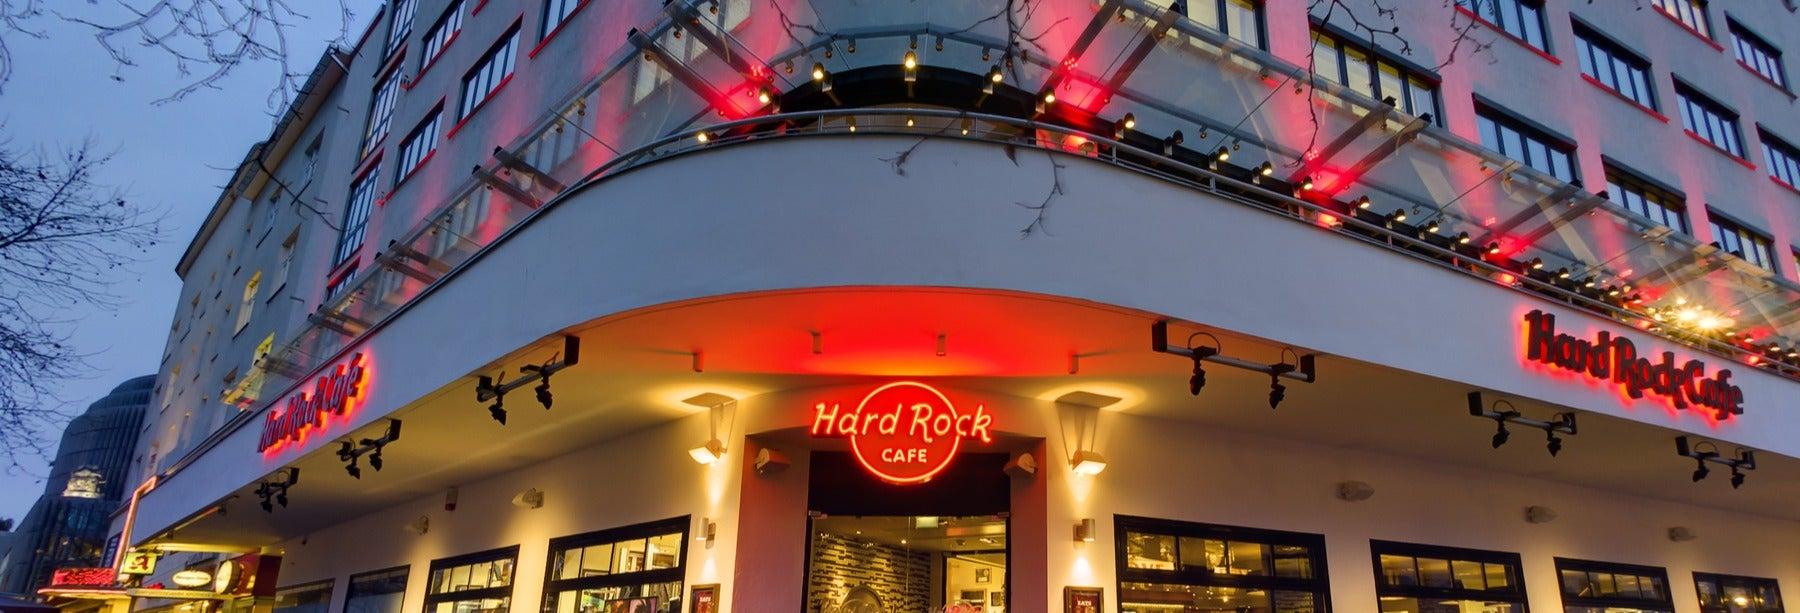 Pranzo o cena all'Hard Rock Cafe Berlino